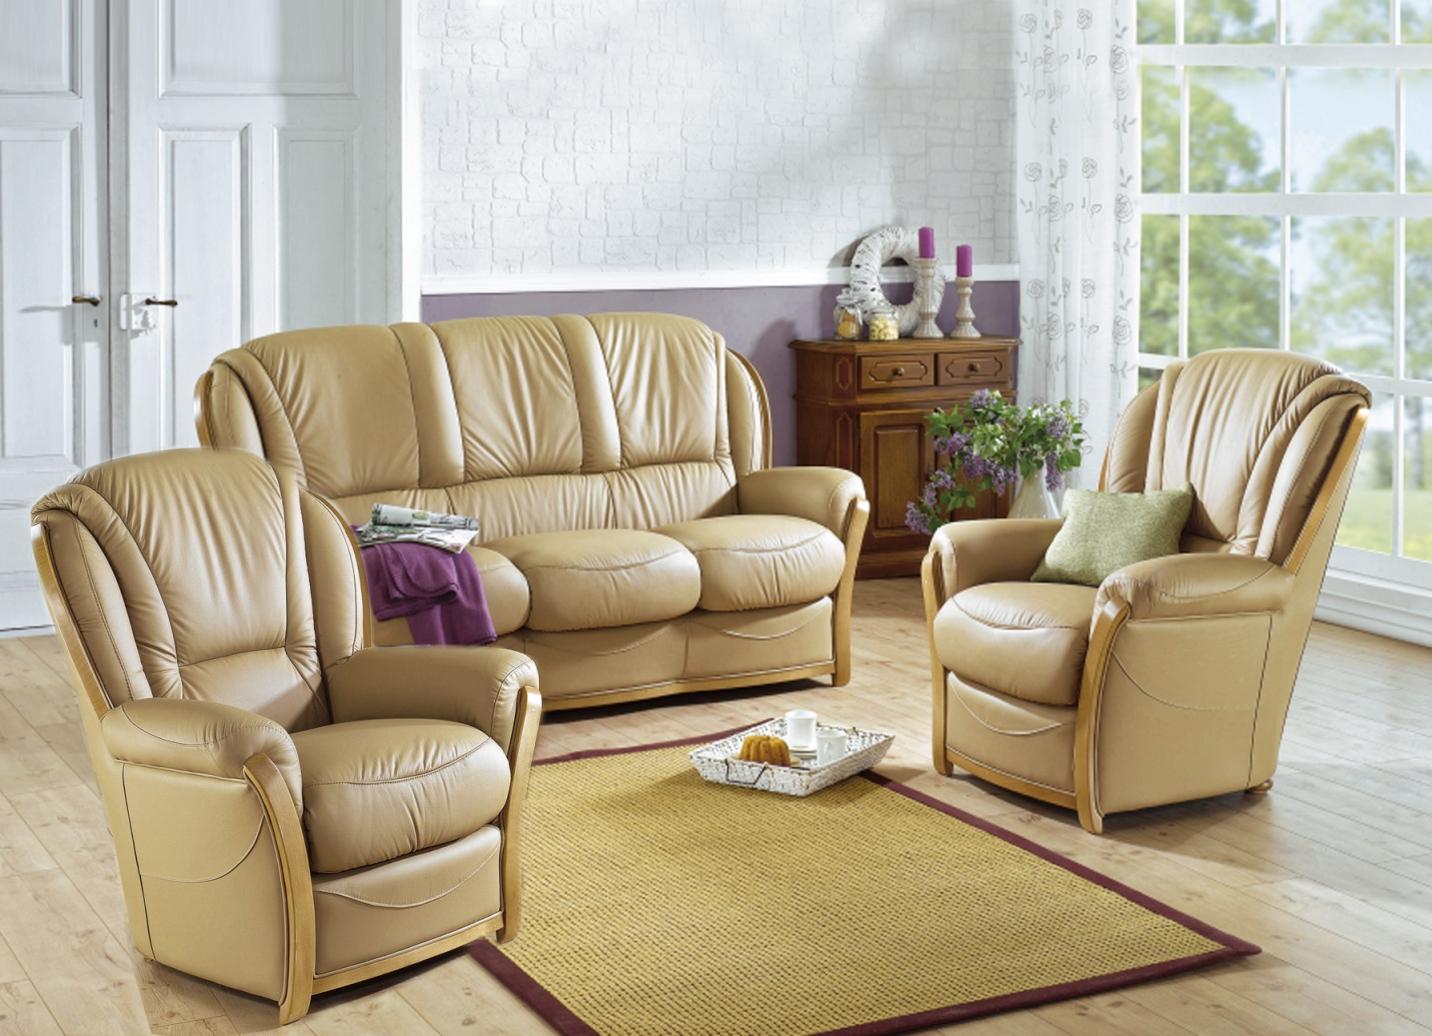 lederm bel in verschiedenen ausf hrungen. Black Bedroom Furniture Sets. Home Design Ideas